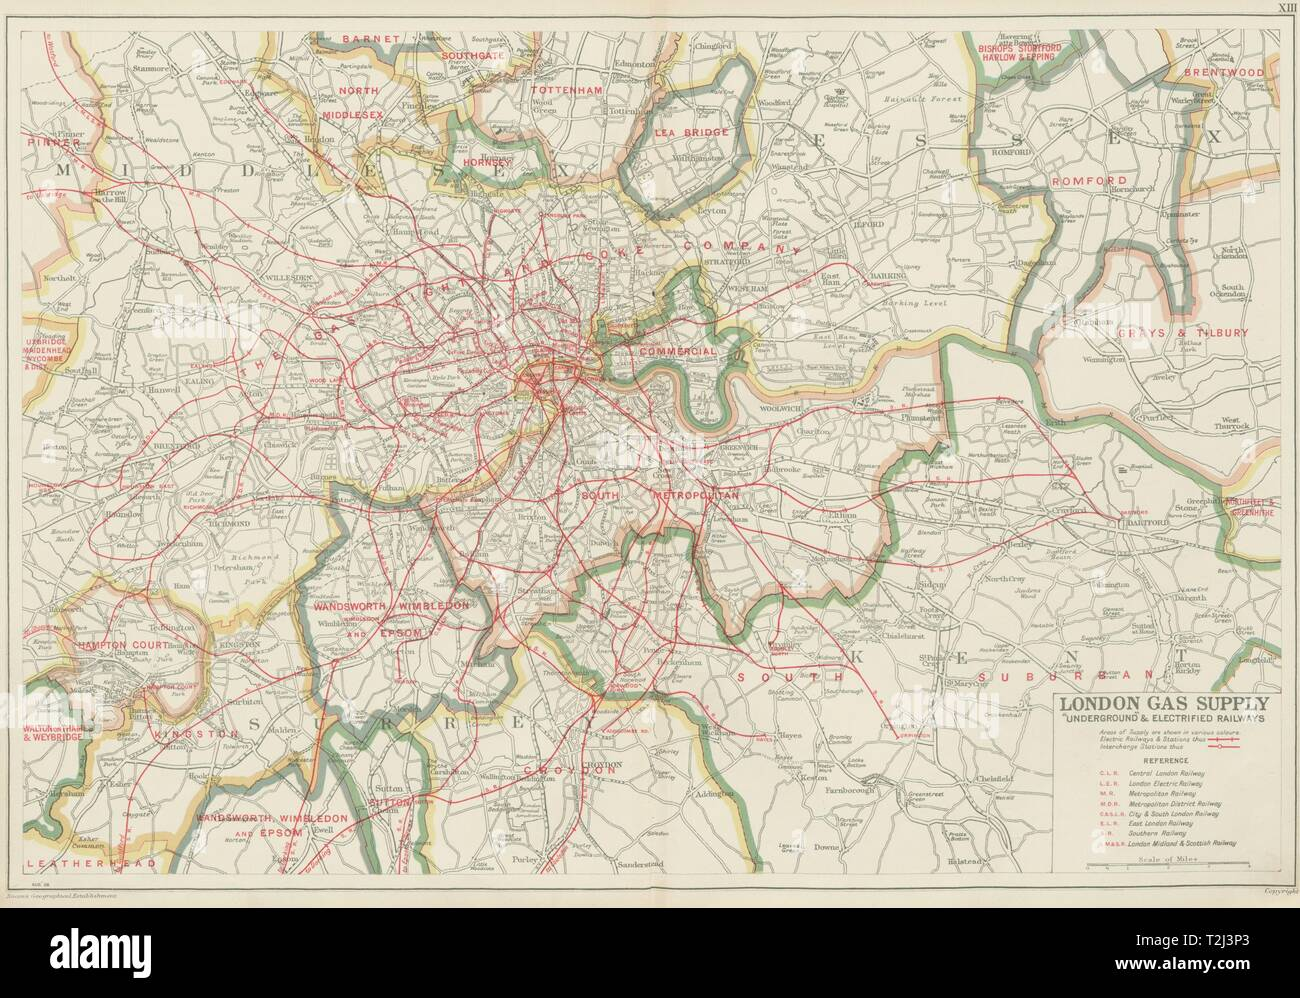 London Map Areas.London Gas Supply Areas Underground Tube Electrified Railways